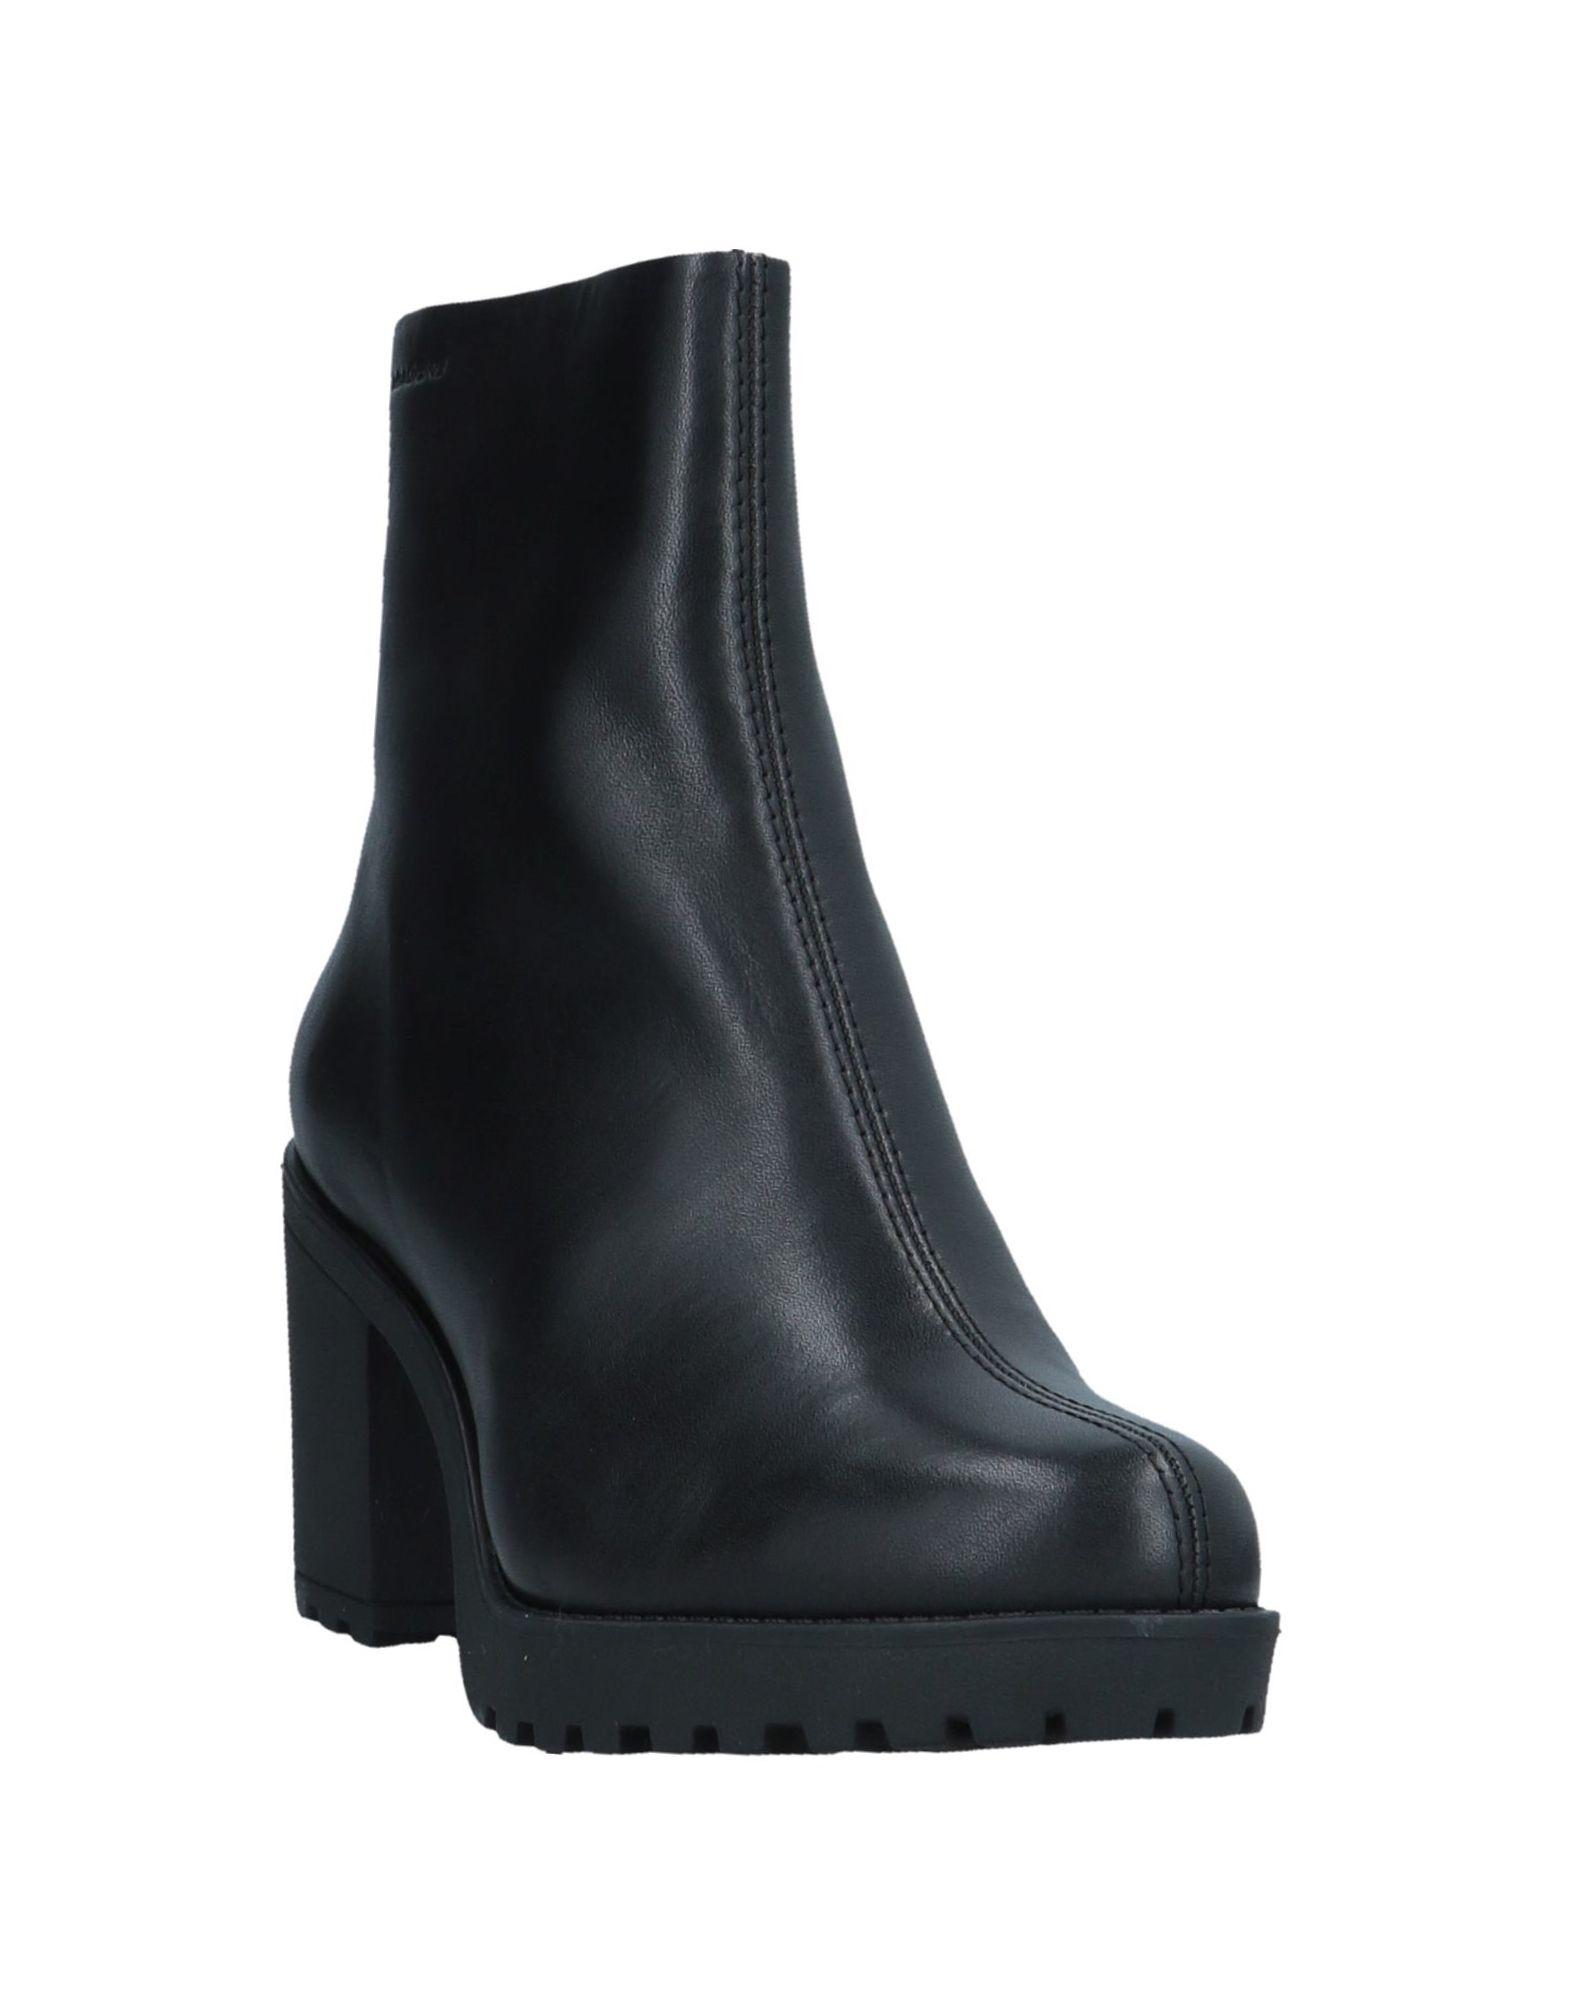 Stilvolle billige Schuhe Vagabond 11574069JS Shoemakers Stiefelette Damen  11574069JS Vagabond 82f85f